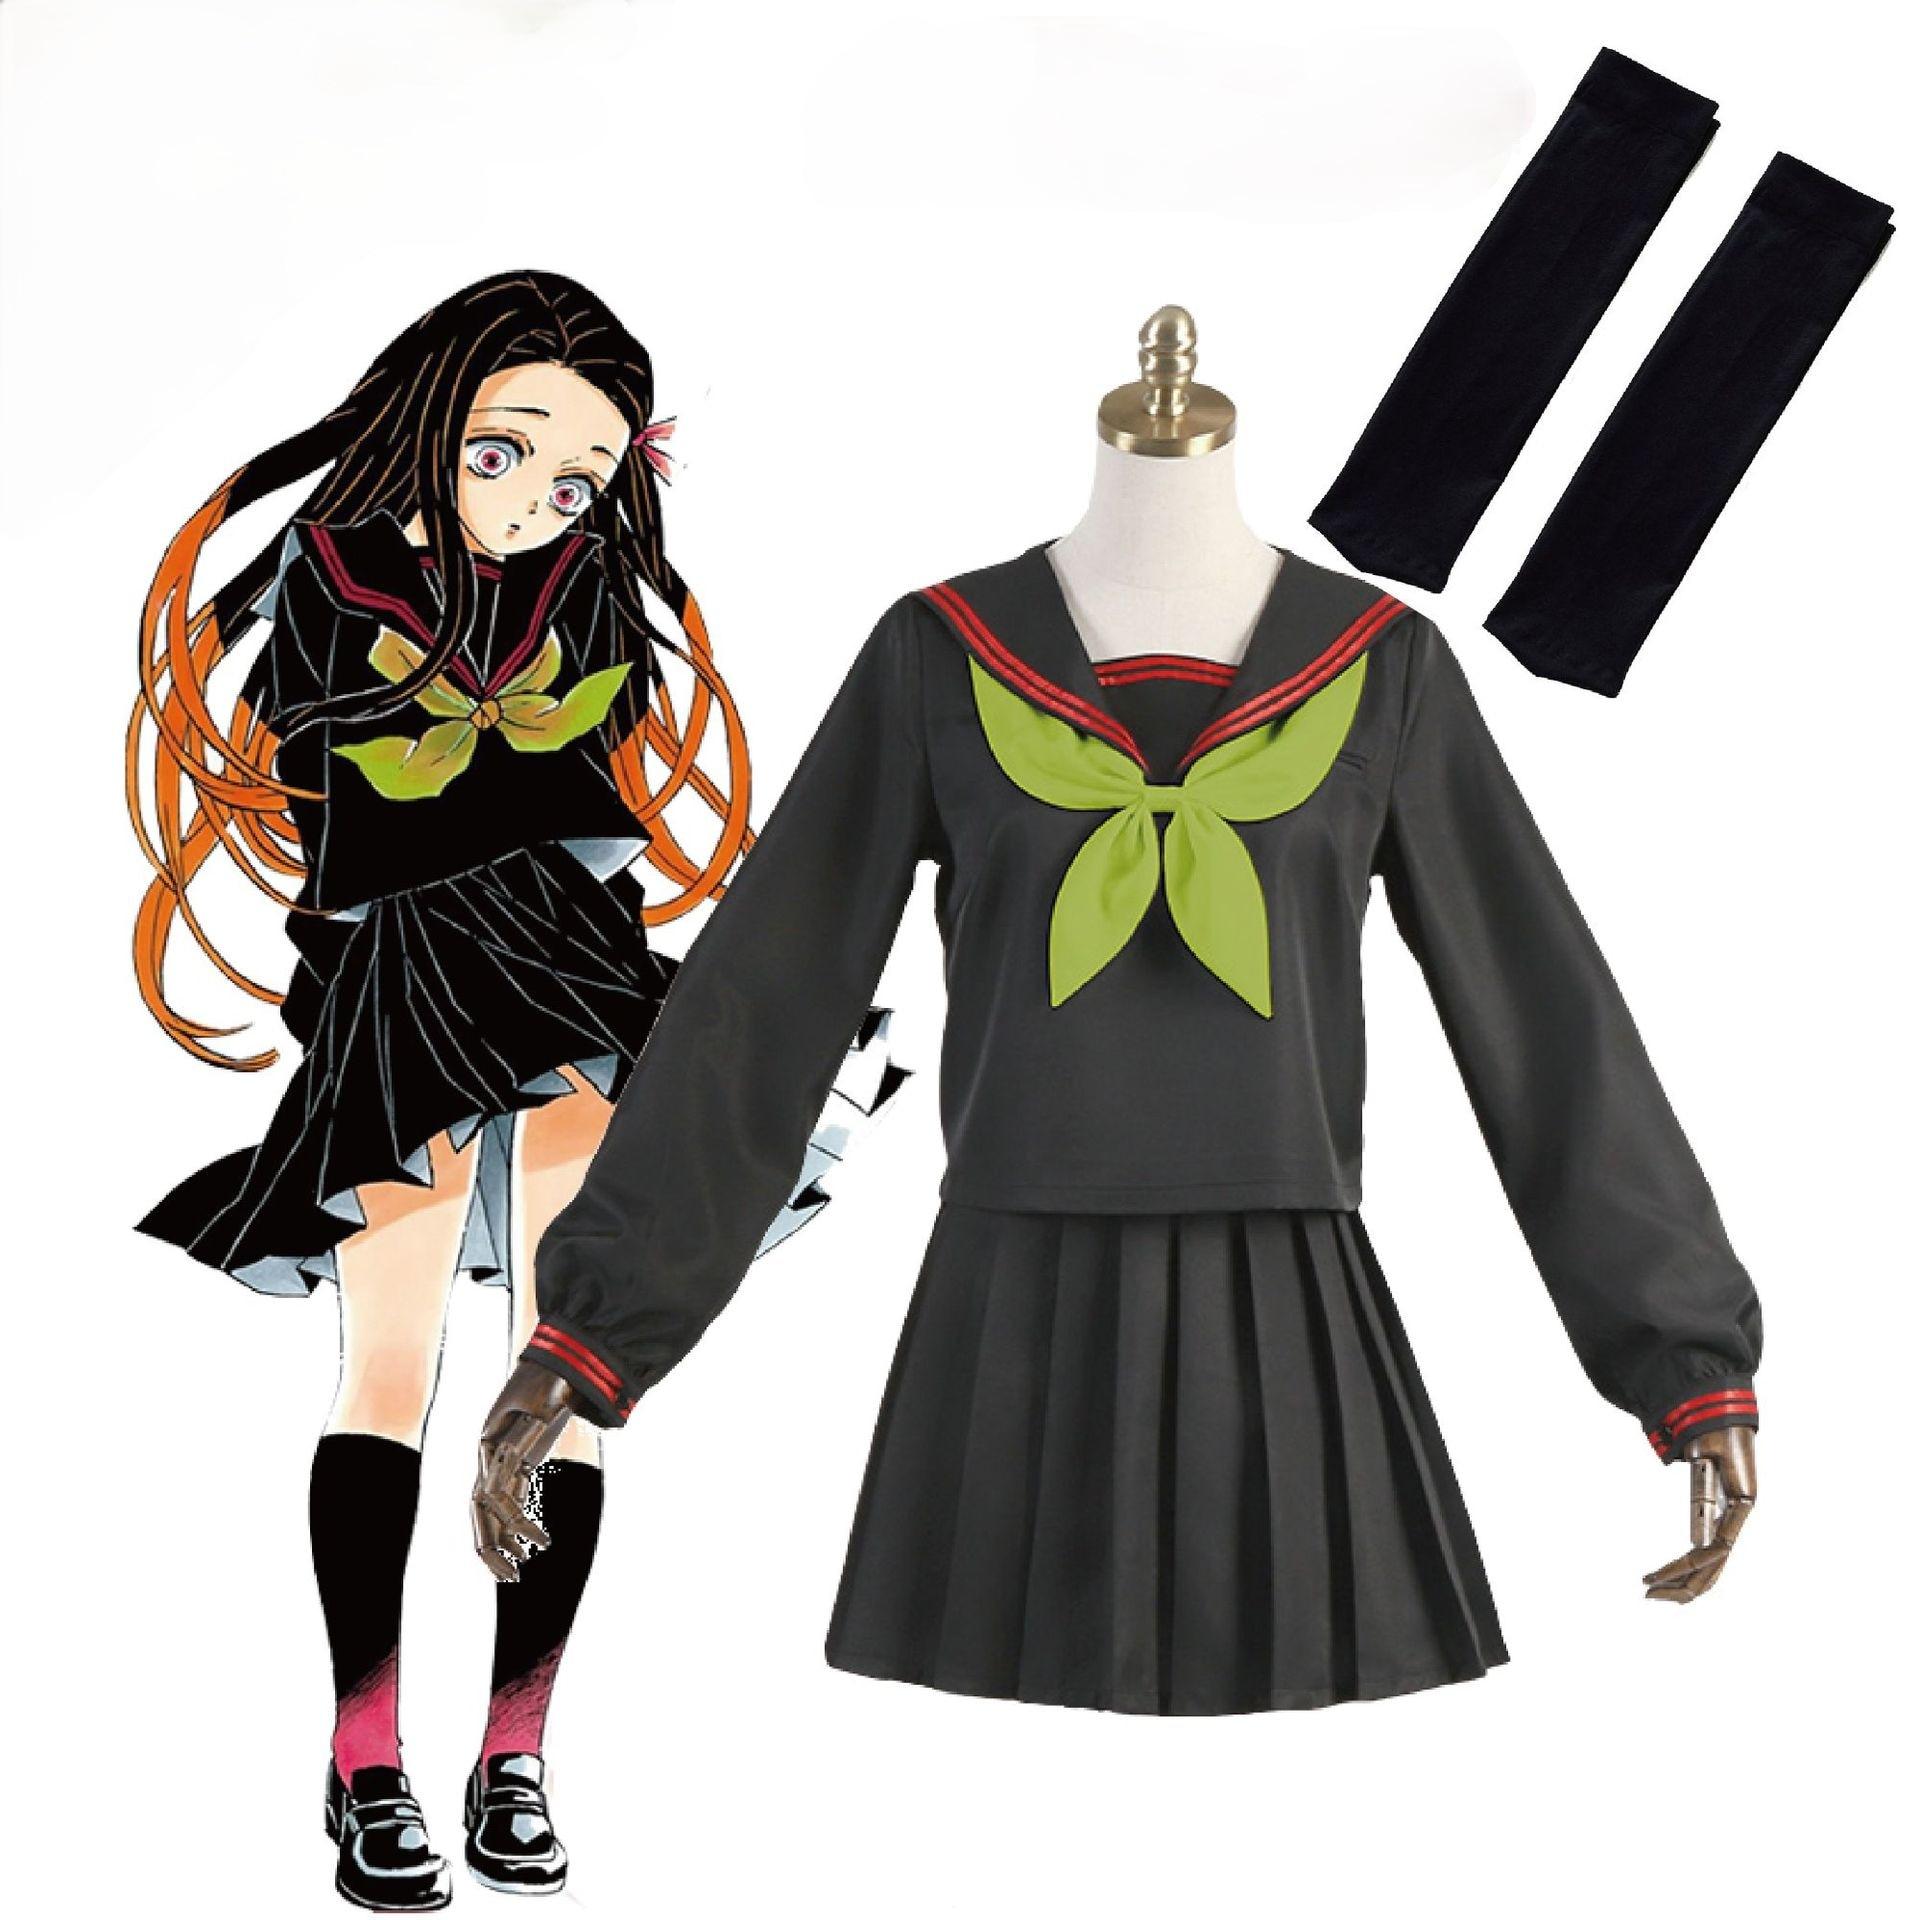 Cosplay Demon Slayer Kimetsu No Yaiba Costume Nezuko Kamado Makomo Uniforms Cartoons Sailor Dress Suit Contains Socks for Female  - buy with discount